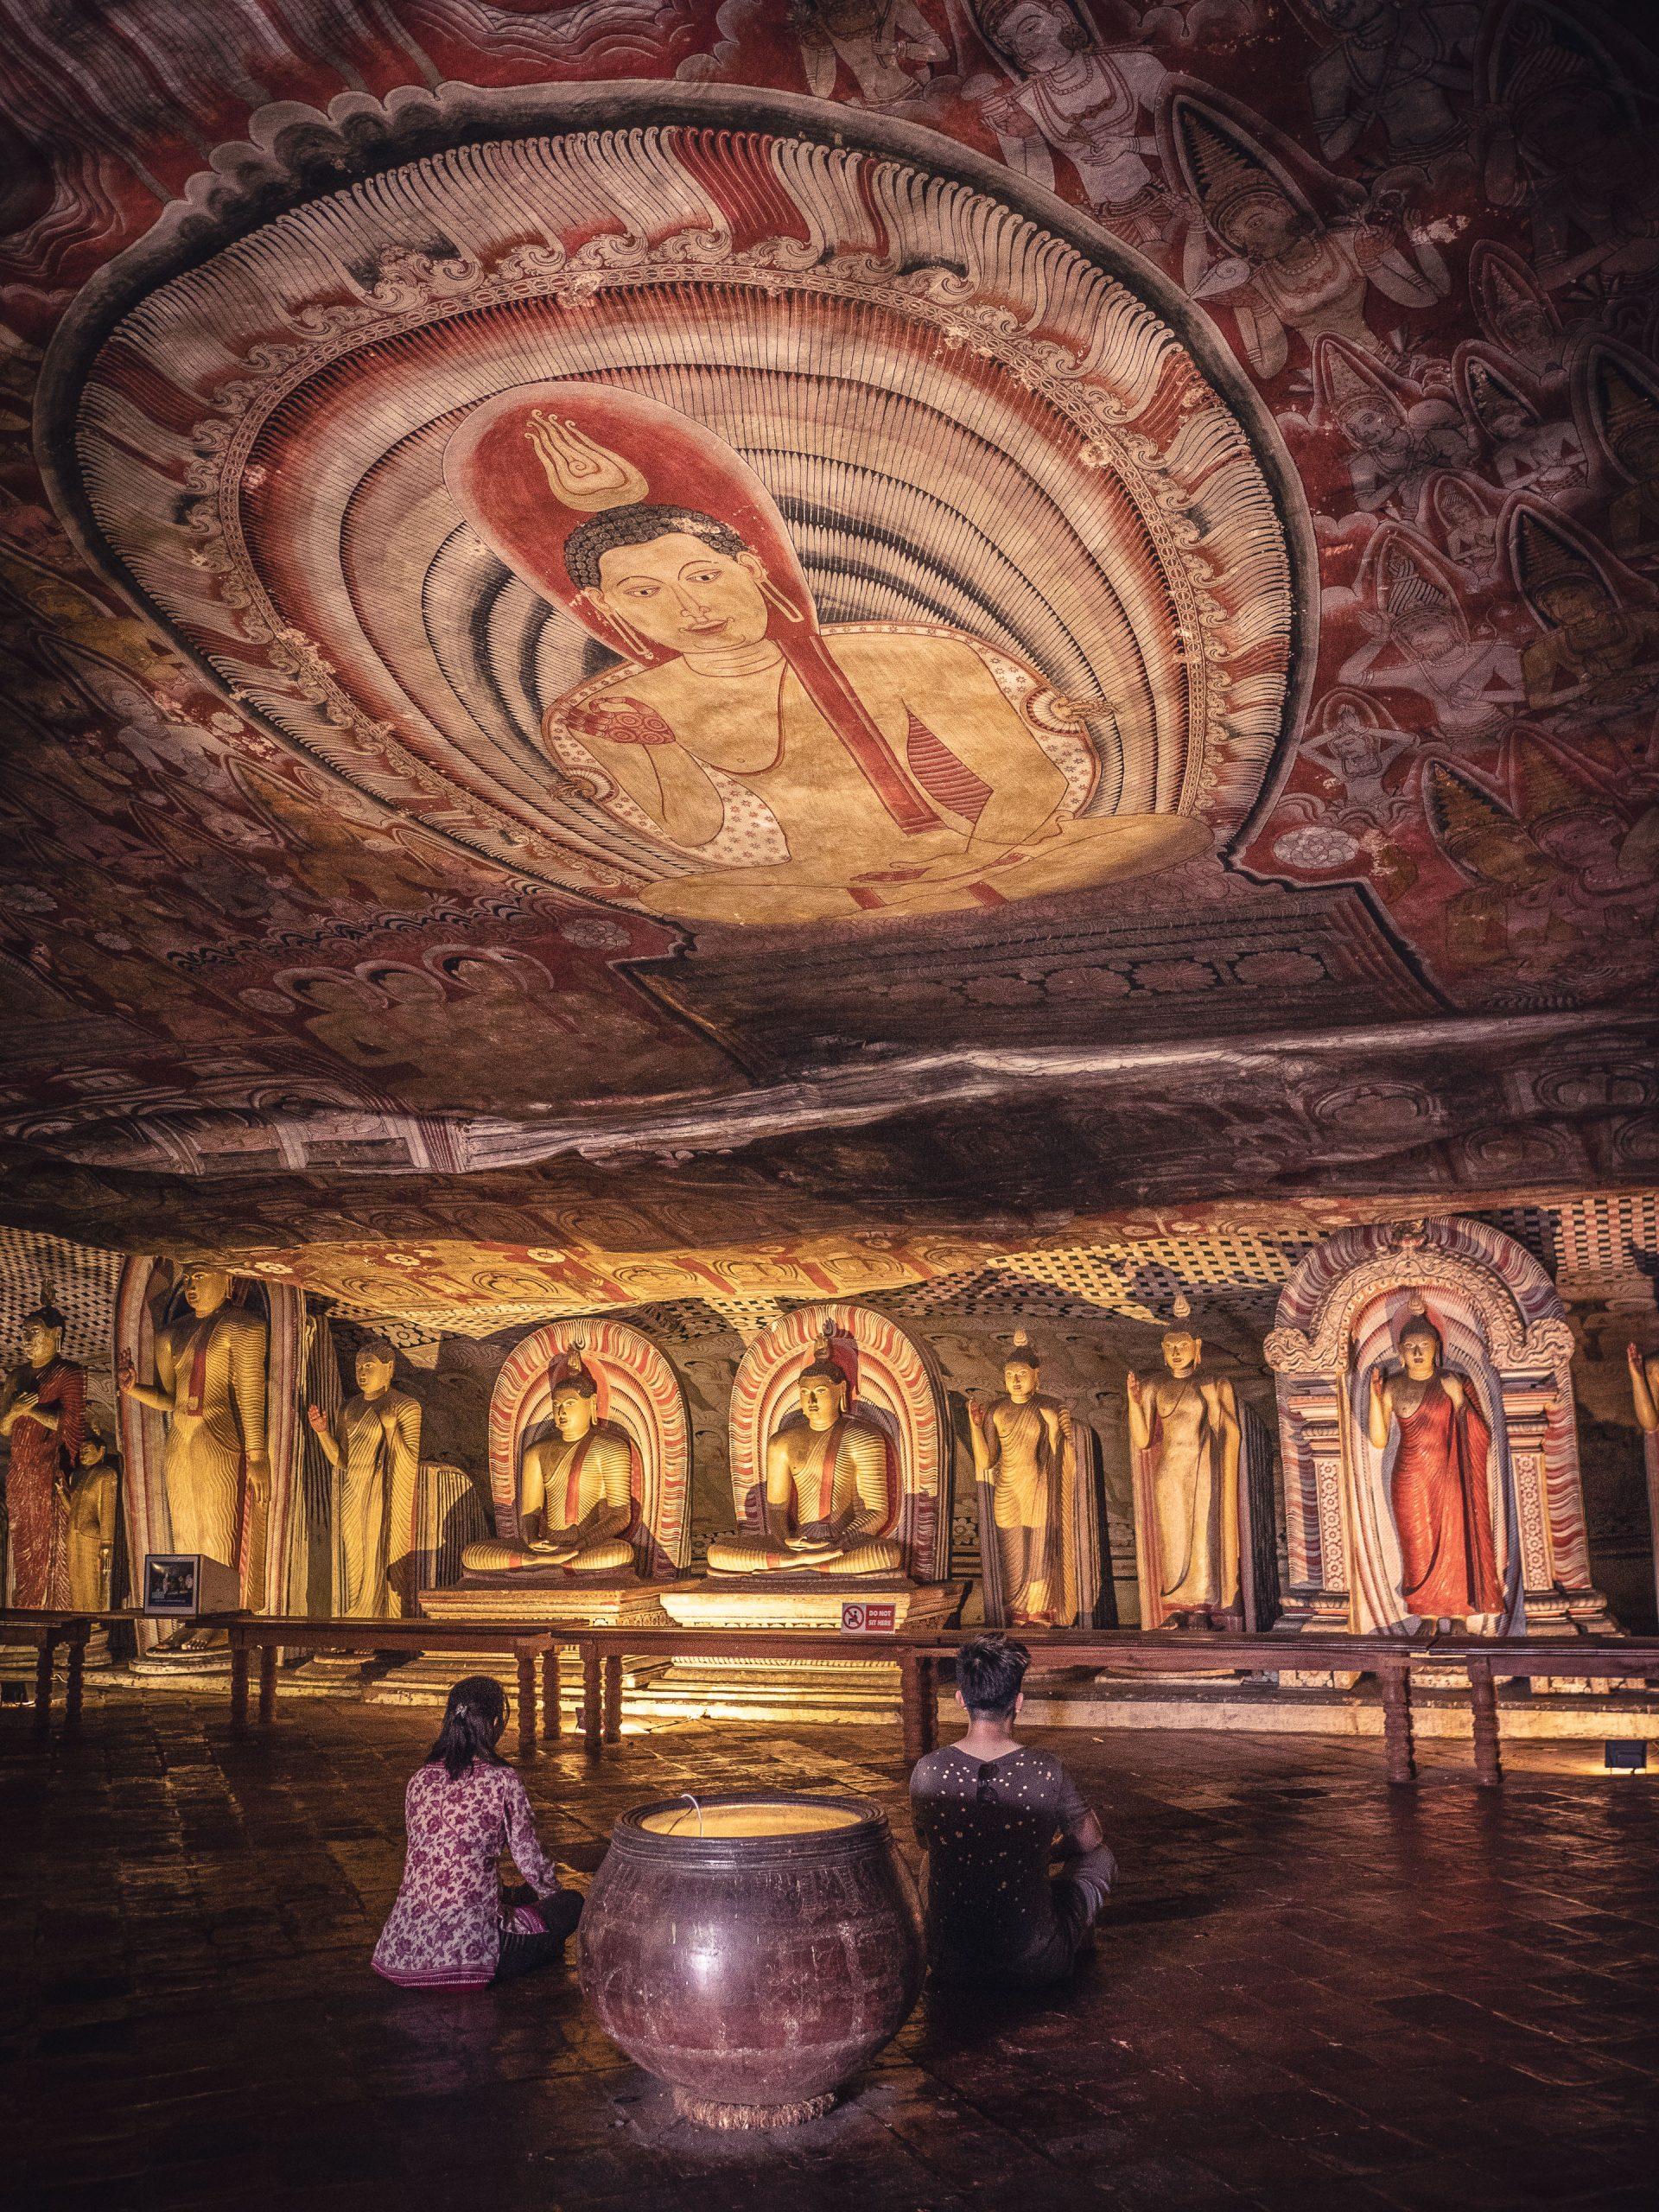 Temple d'or de dambulla au Sri Lanka - grotte